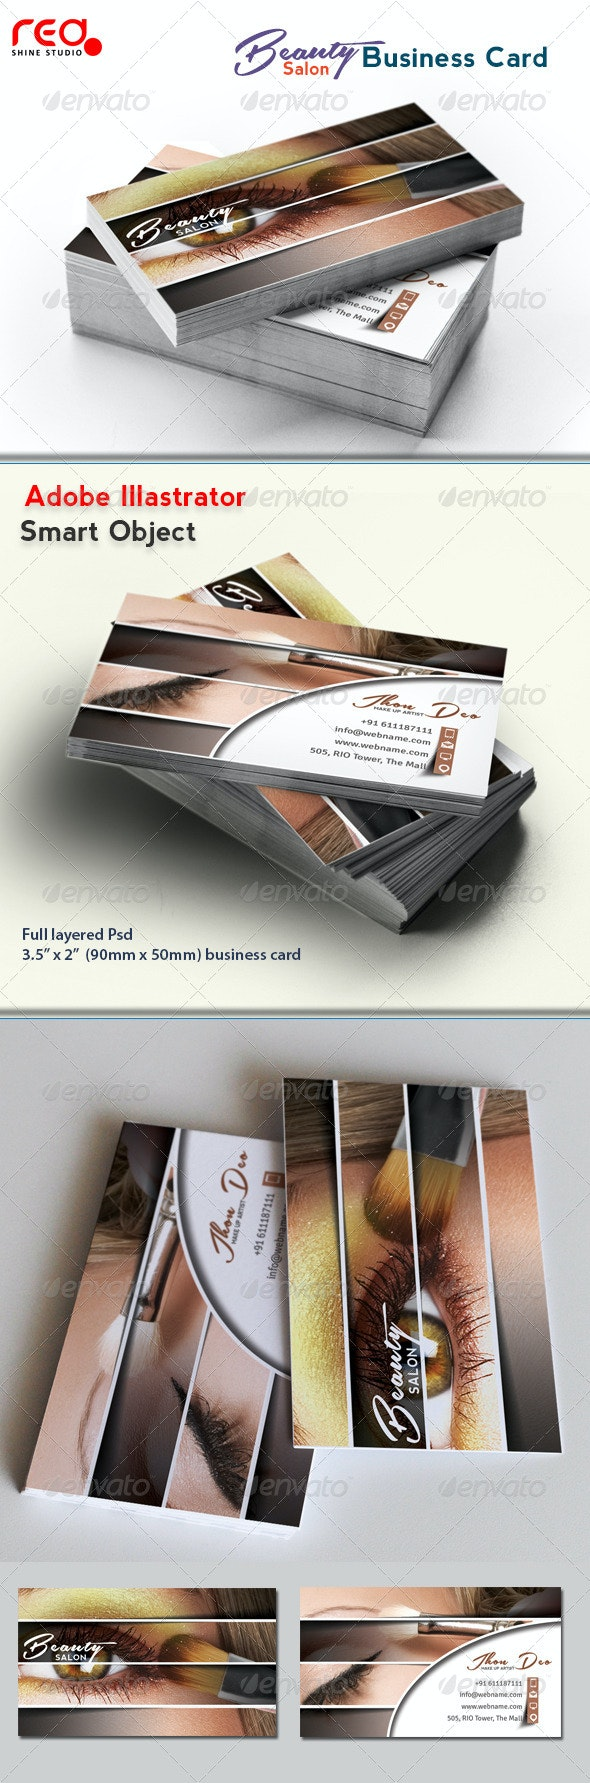 Beauty Salon Business Card - Creative Business Cards